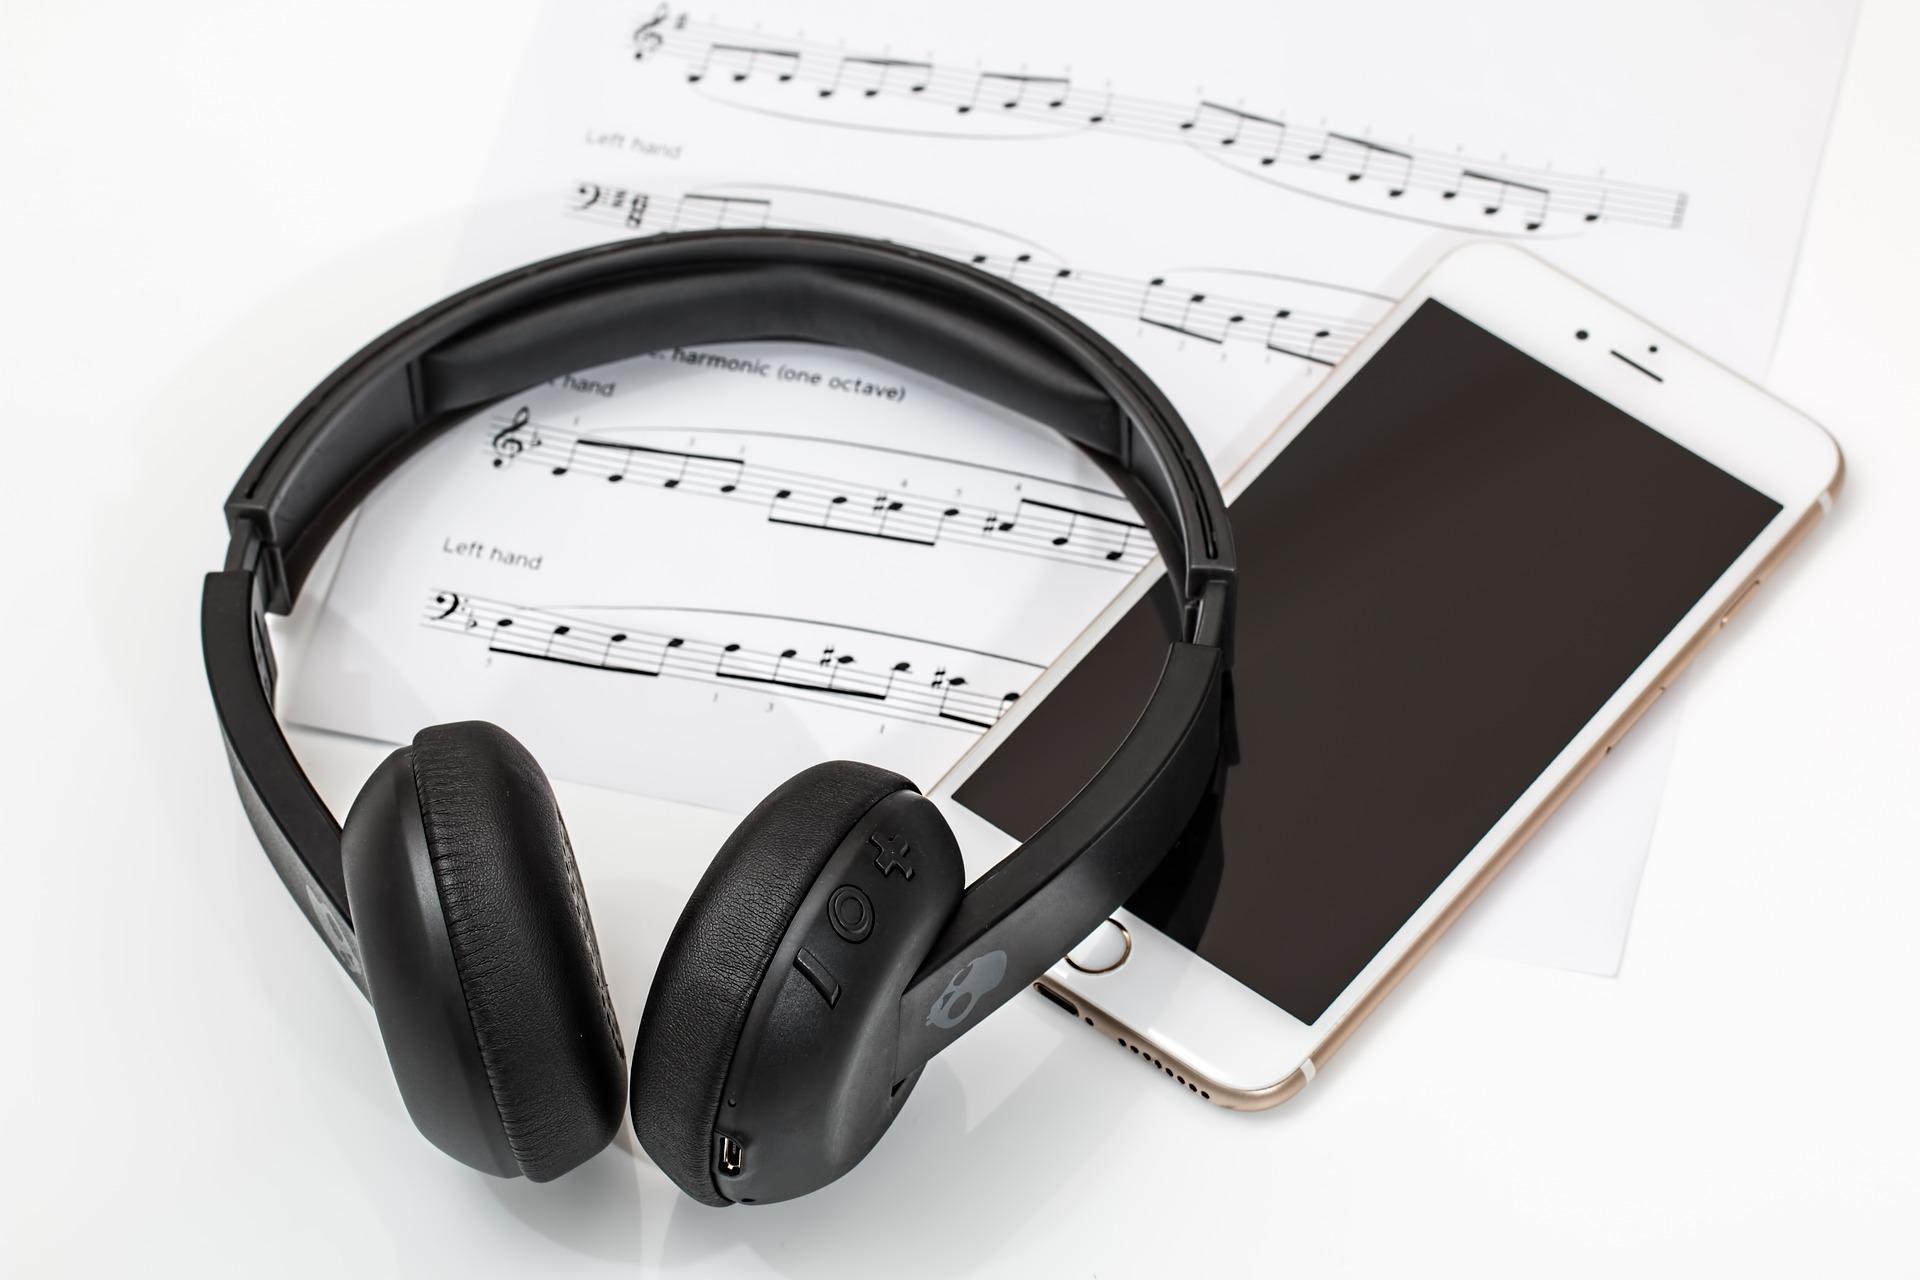 {#headphones-2789078_1920}